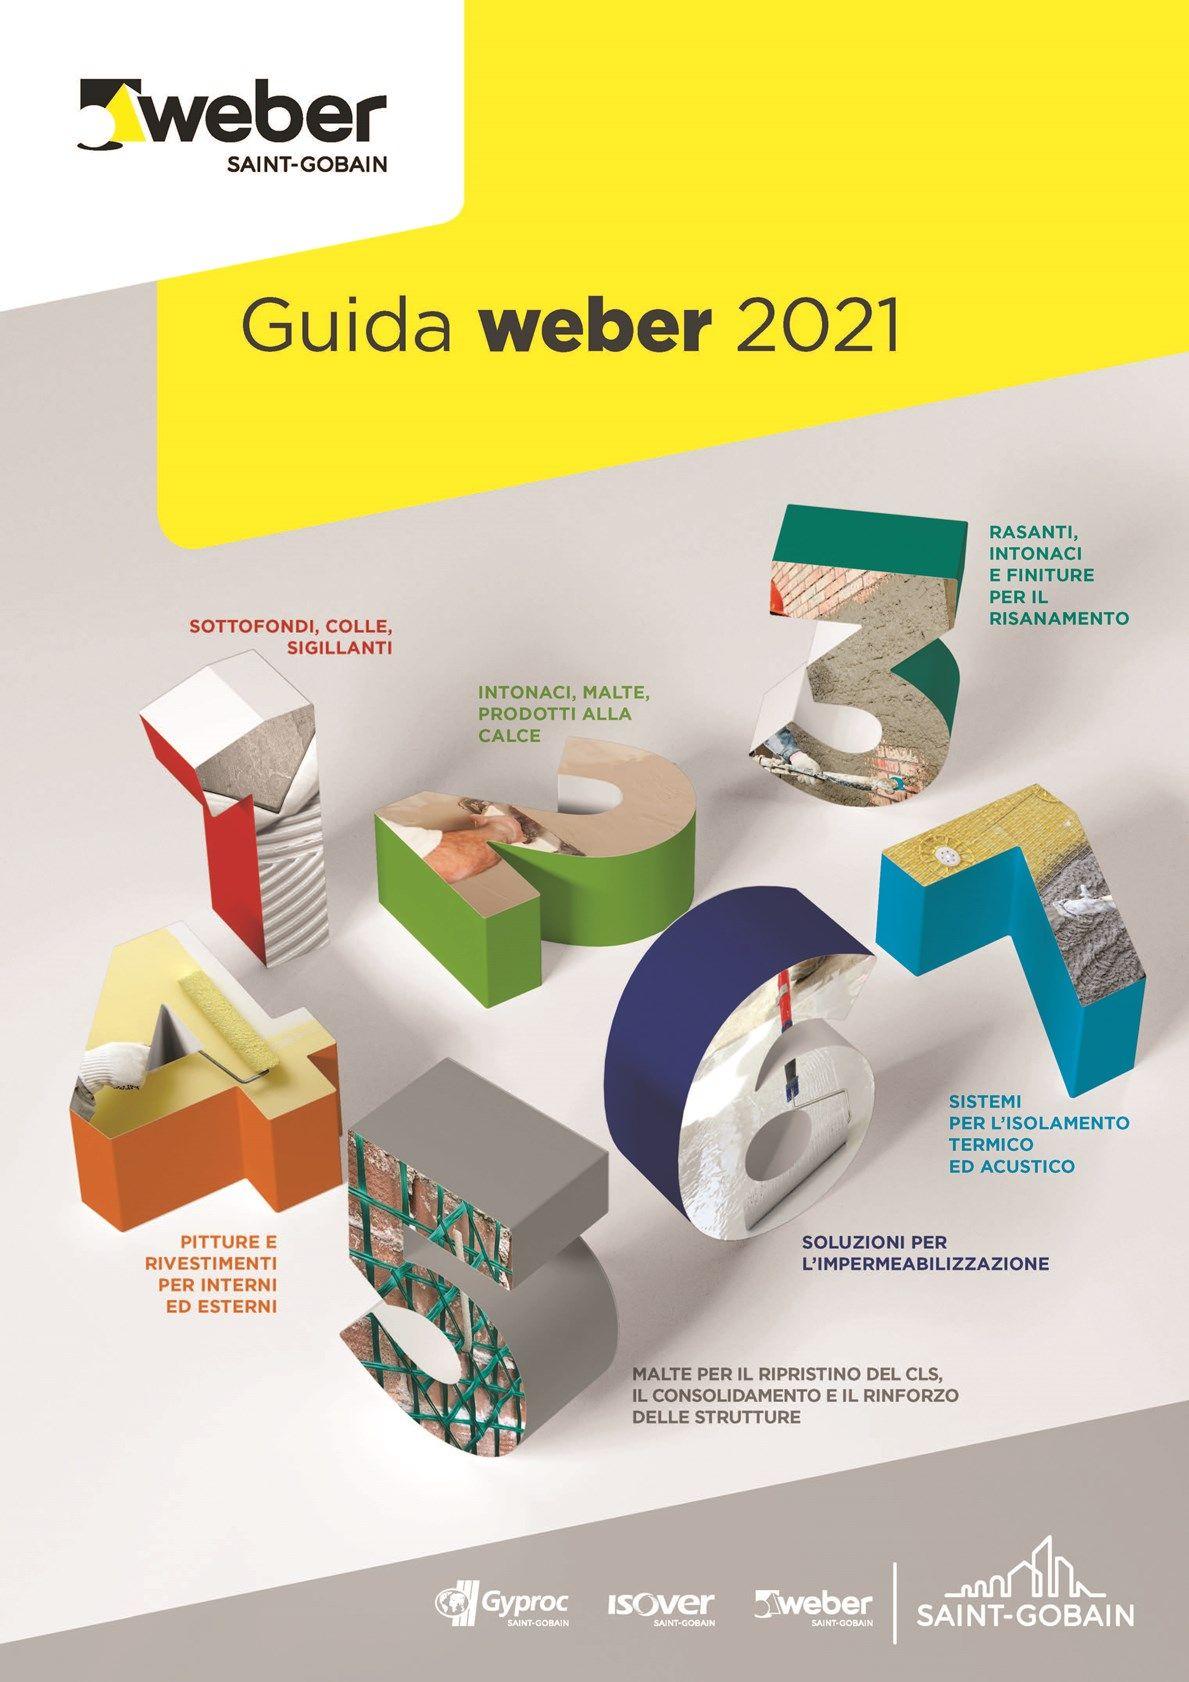 Arriva la 'Guida Weber 2021'